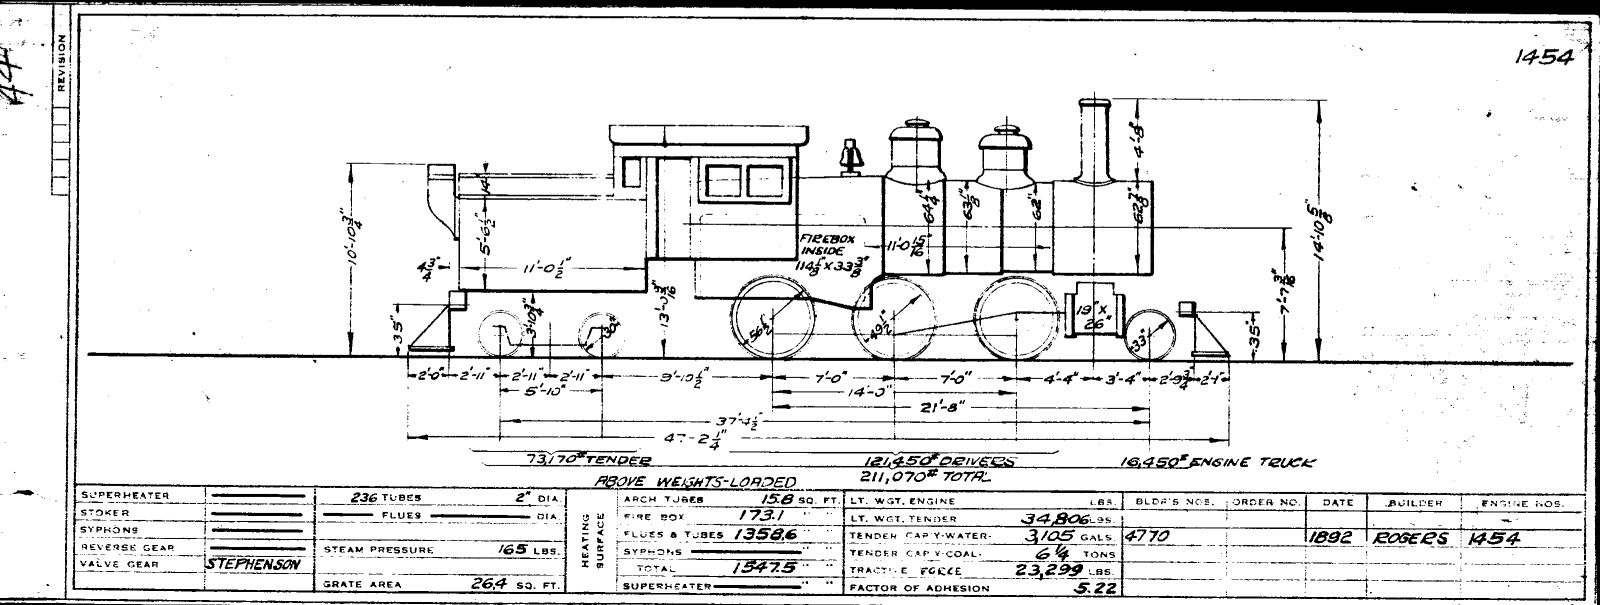 Illinois Central 1933 Locomotive Diagrams